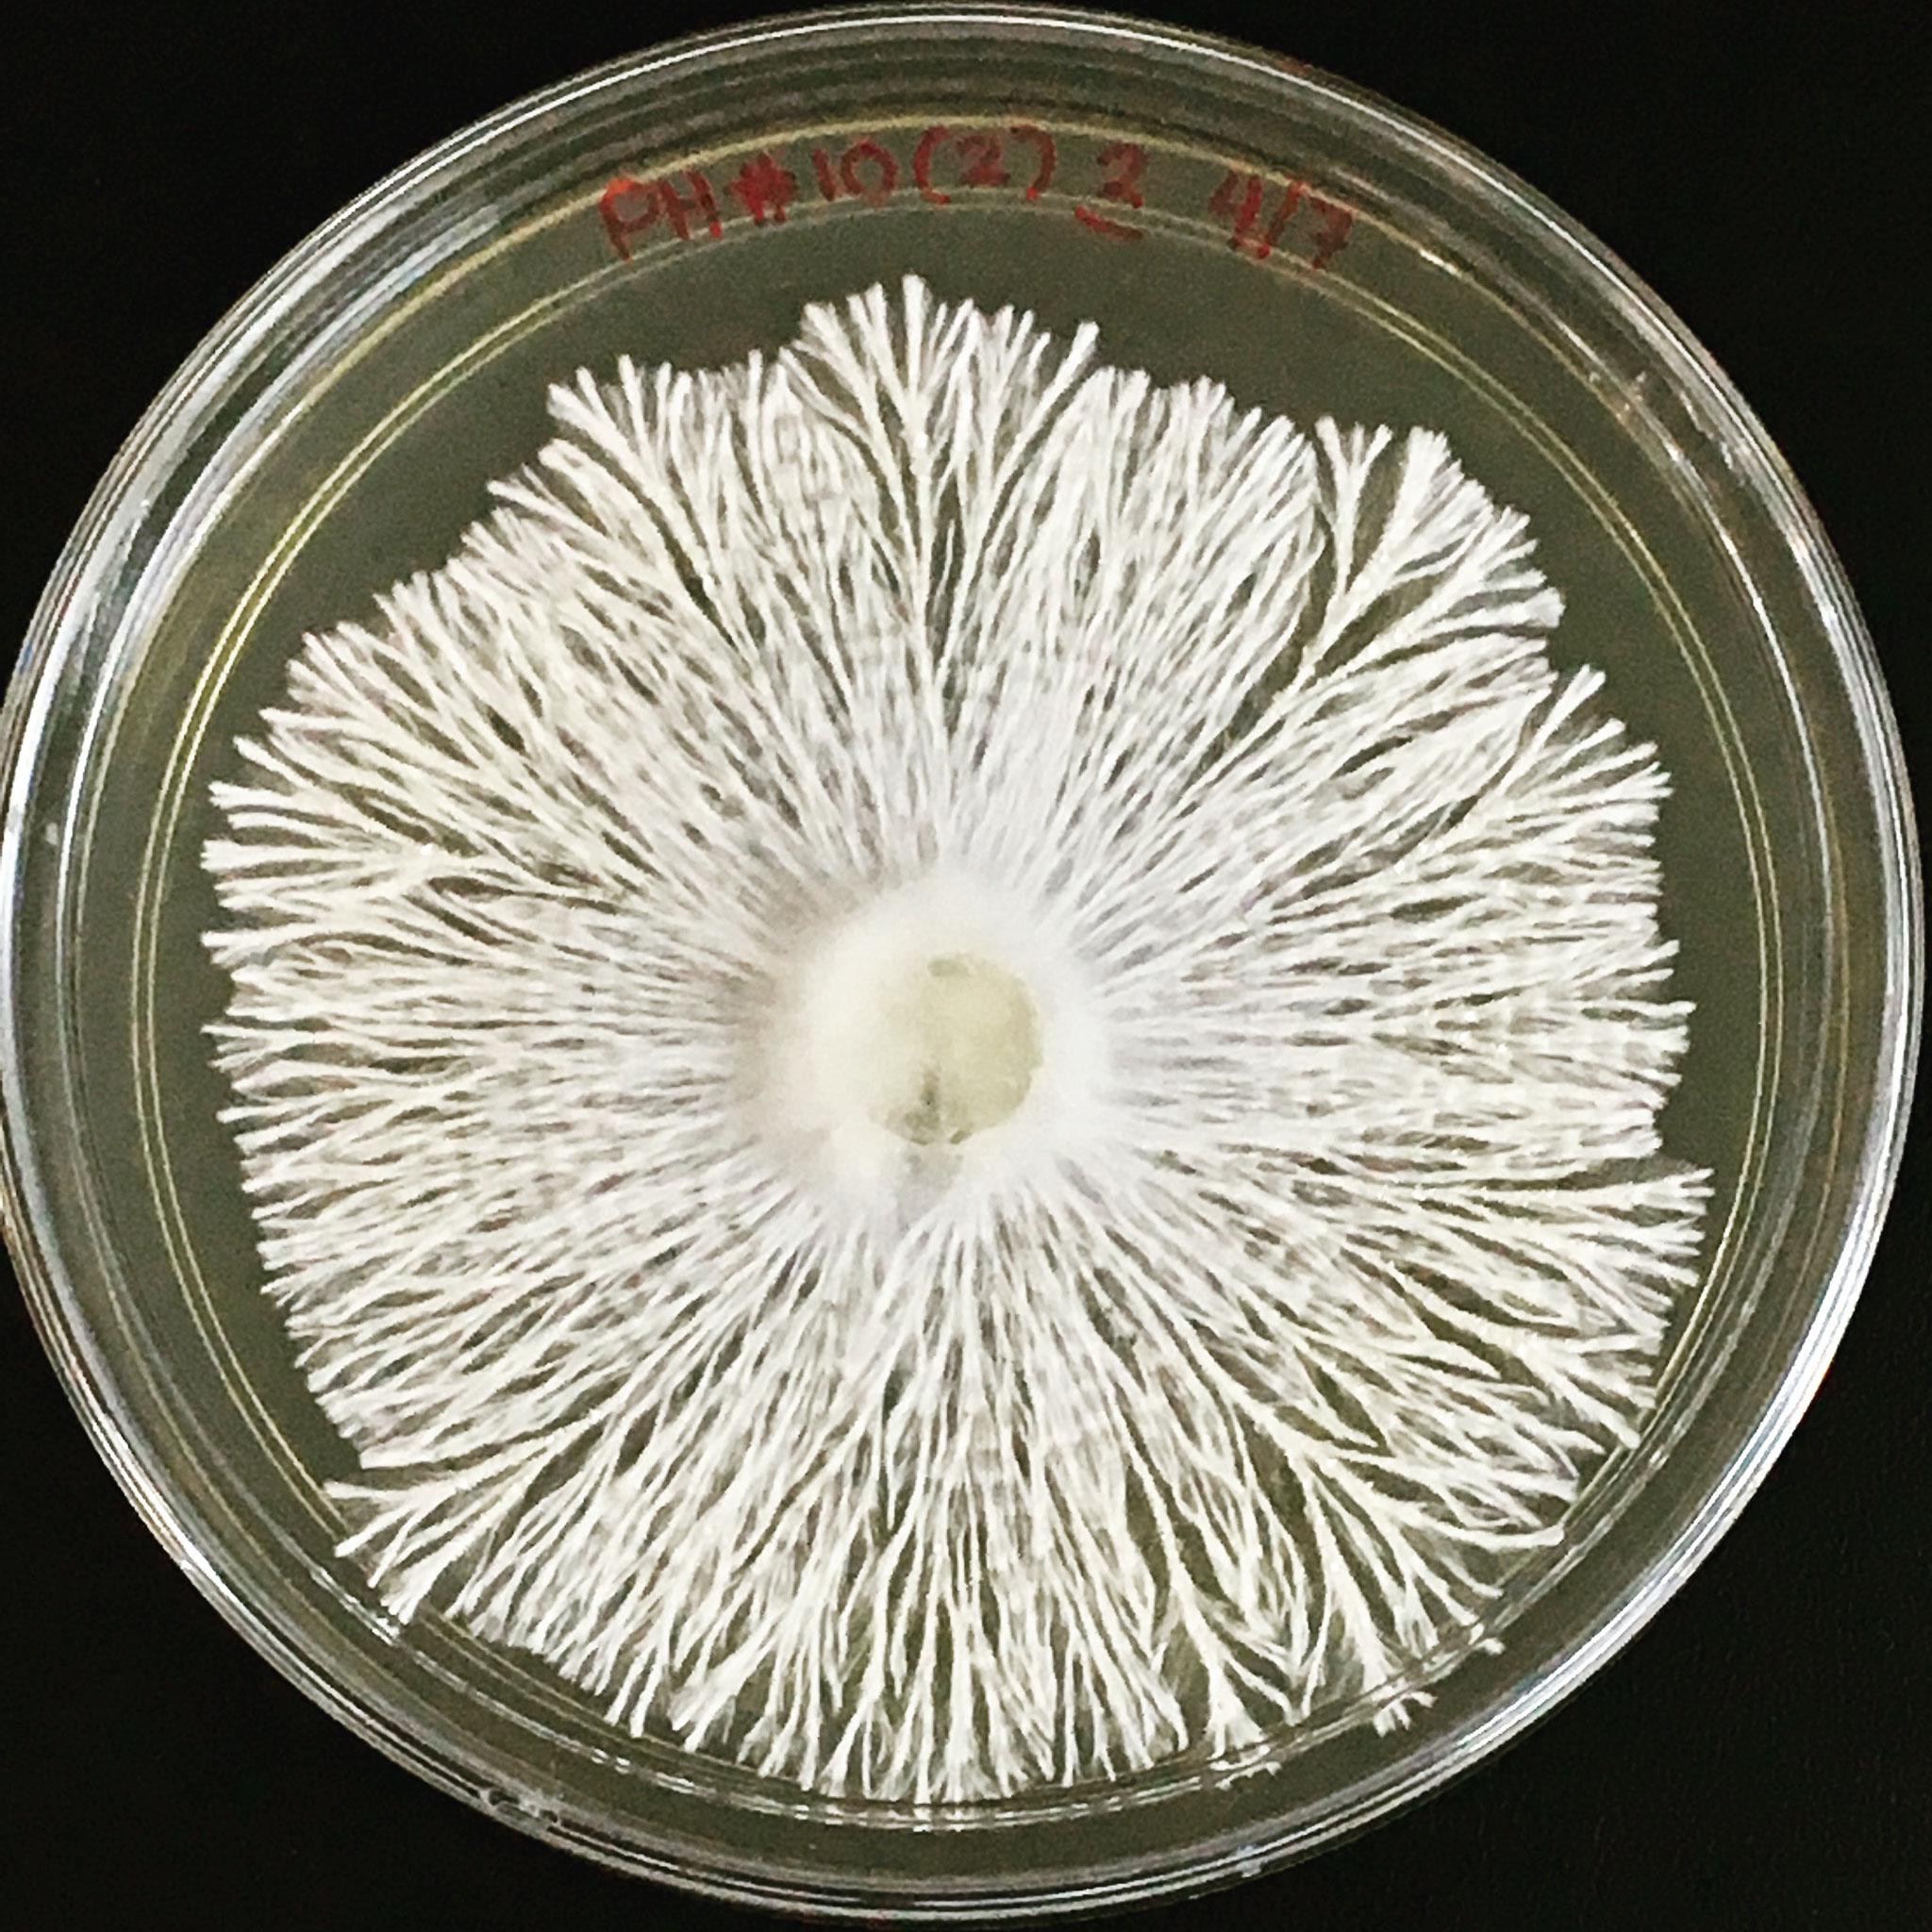 Endolichenic fungi. Photo credits to Krystle